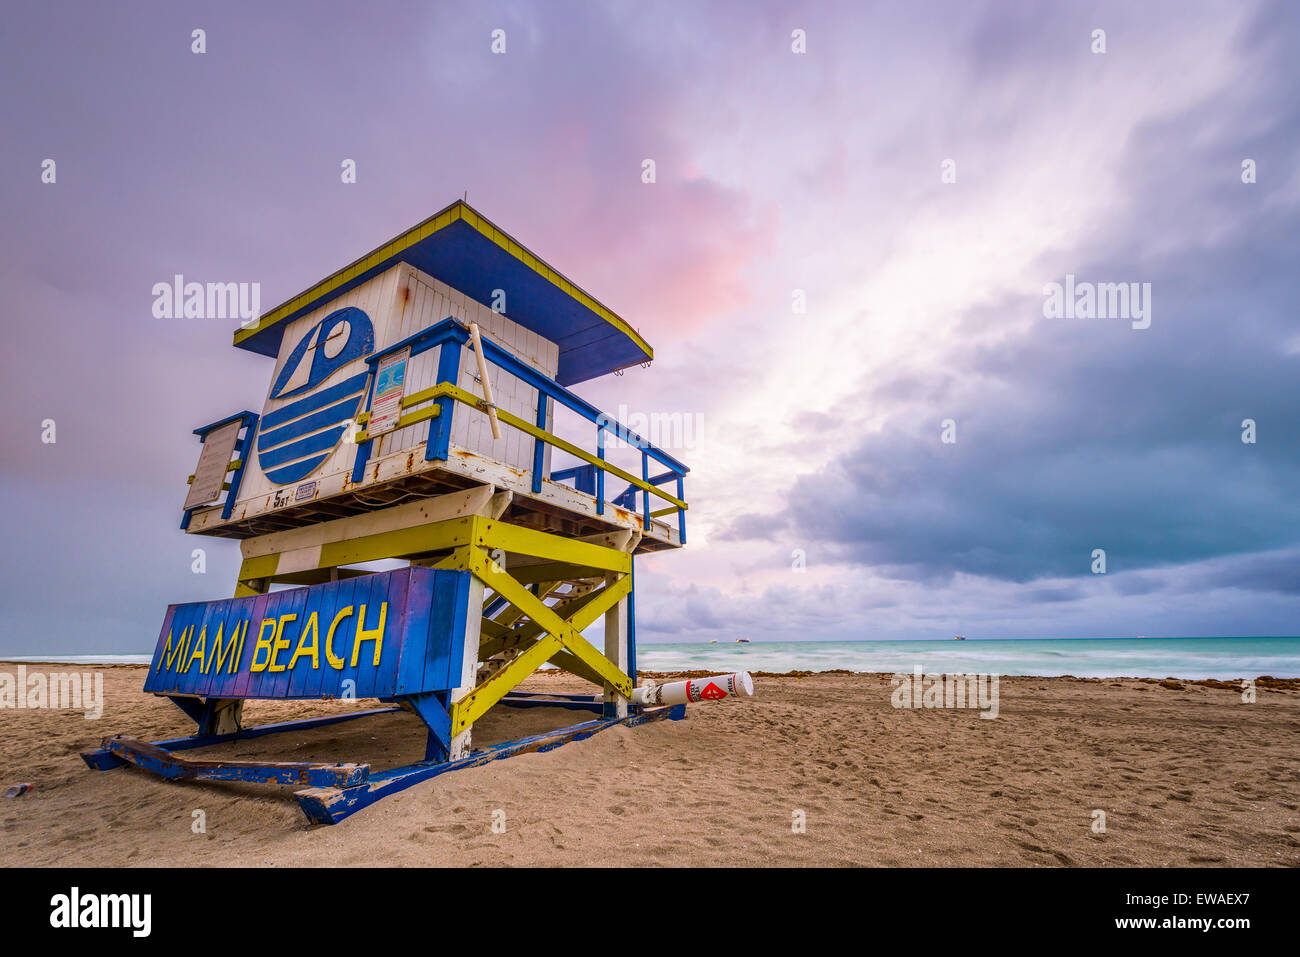 Miami Beach, Florida, USA leben Wachturm. Stockbild